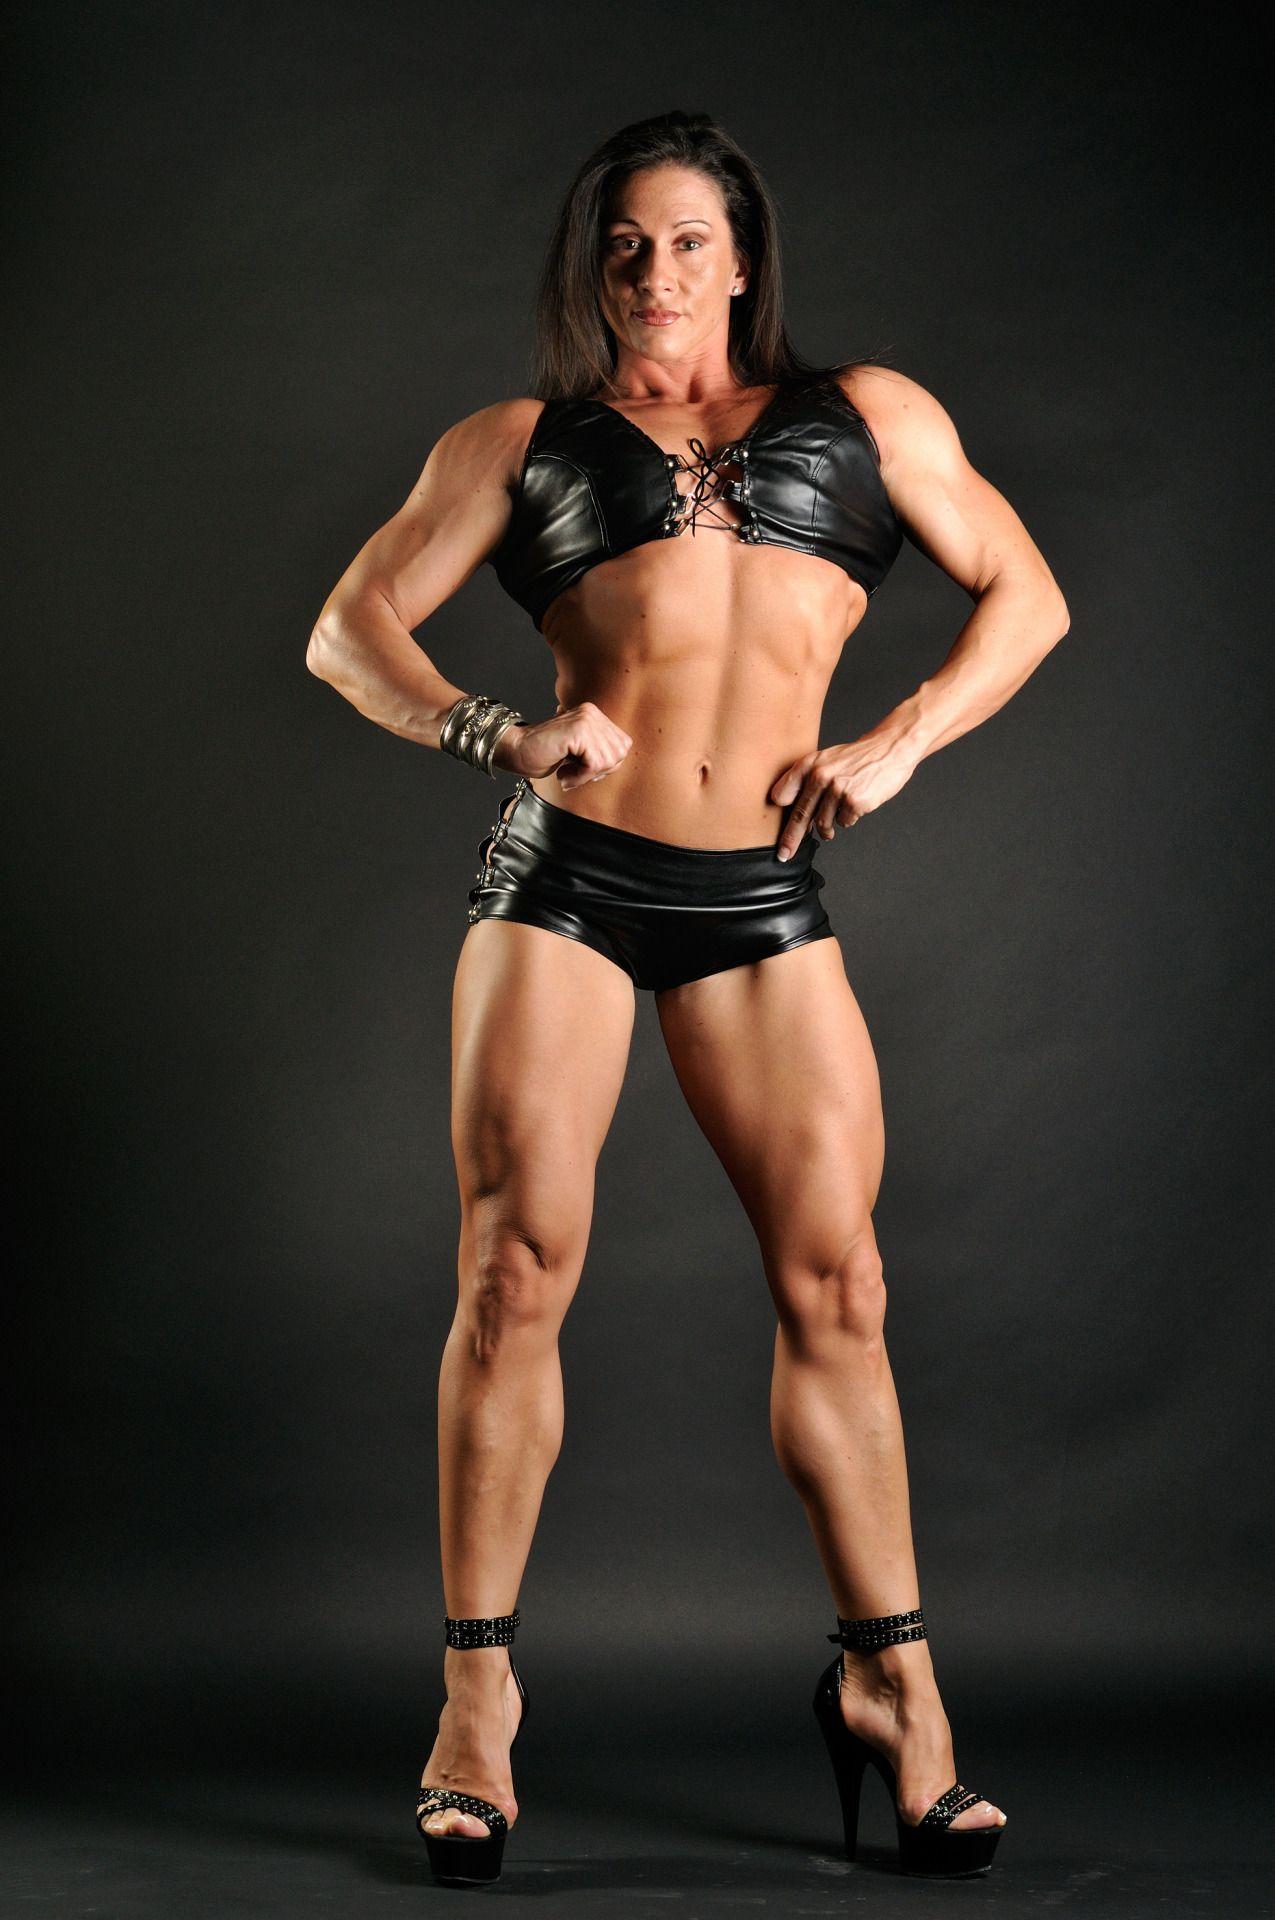 Mature femme fatale female bodybuilder buff girls sex